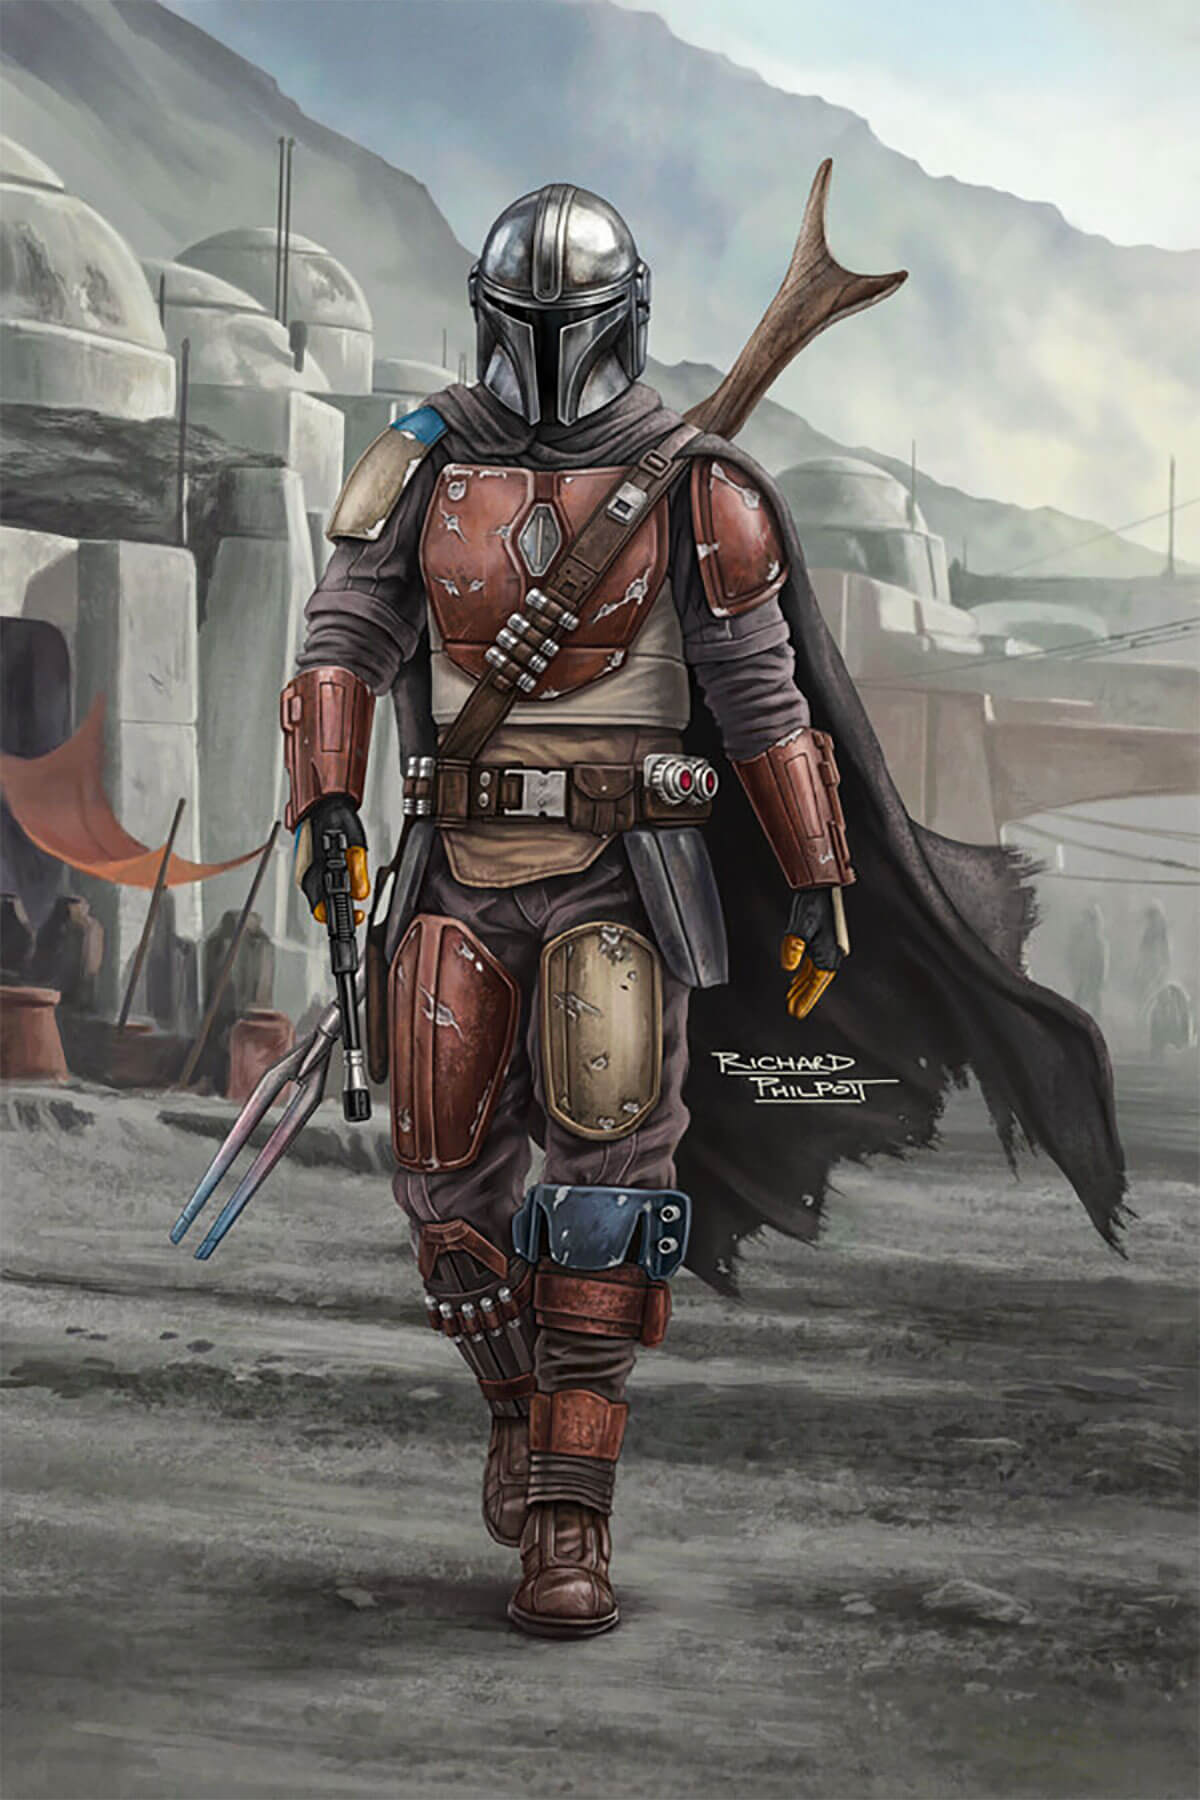 Star Wars The Mandalorian by Richard Philpott